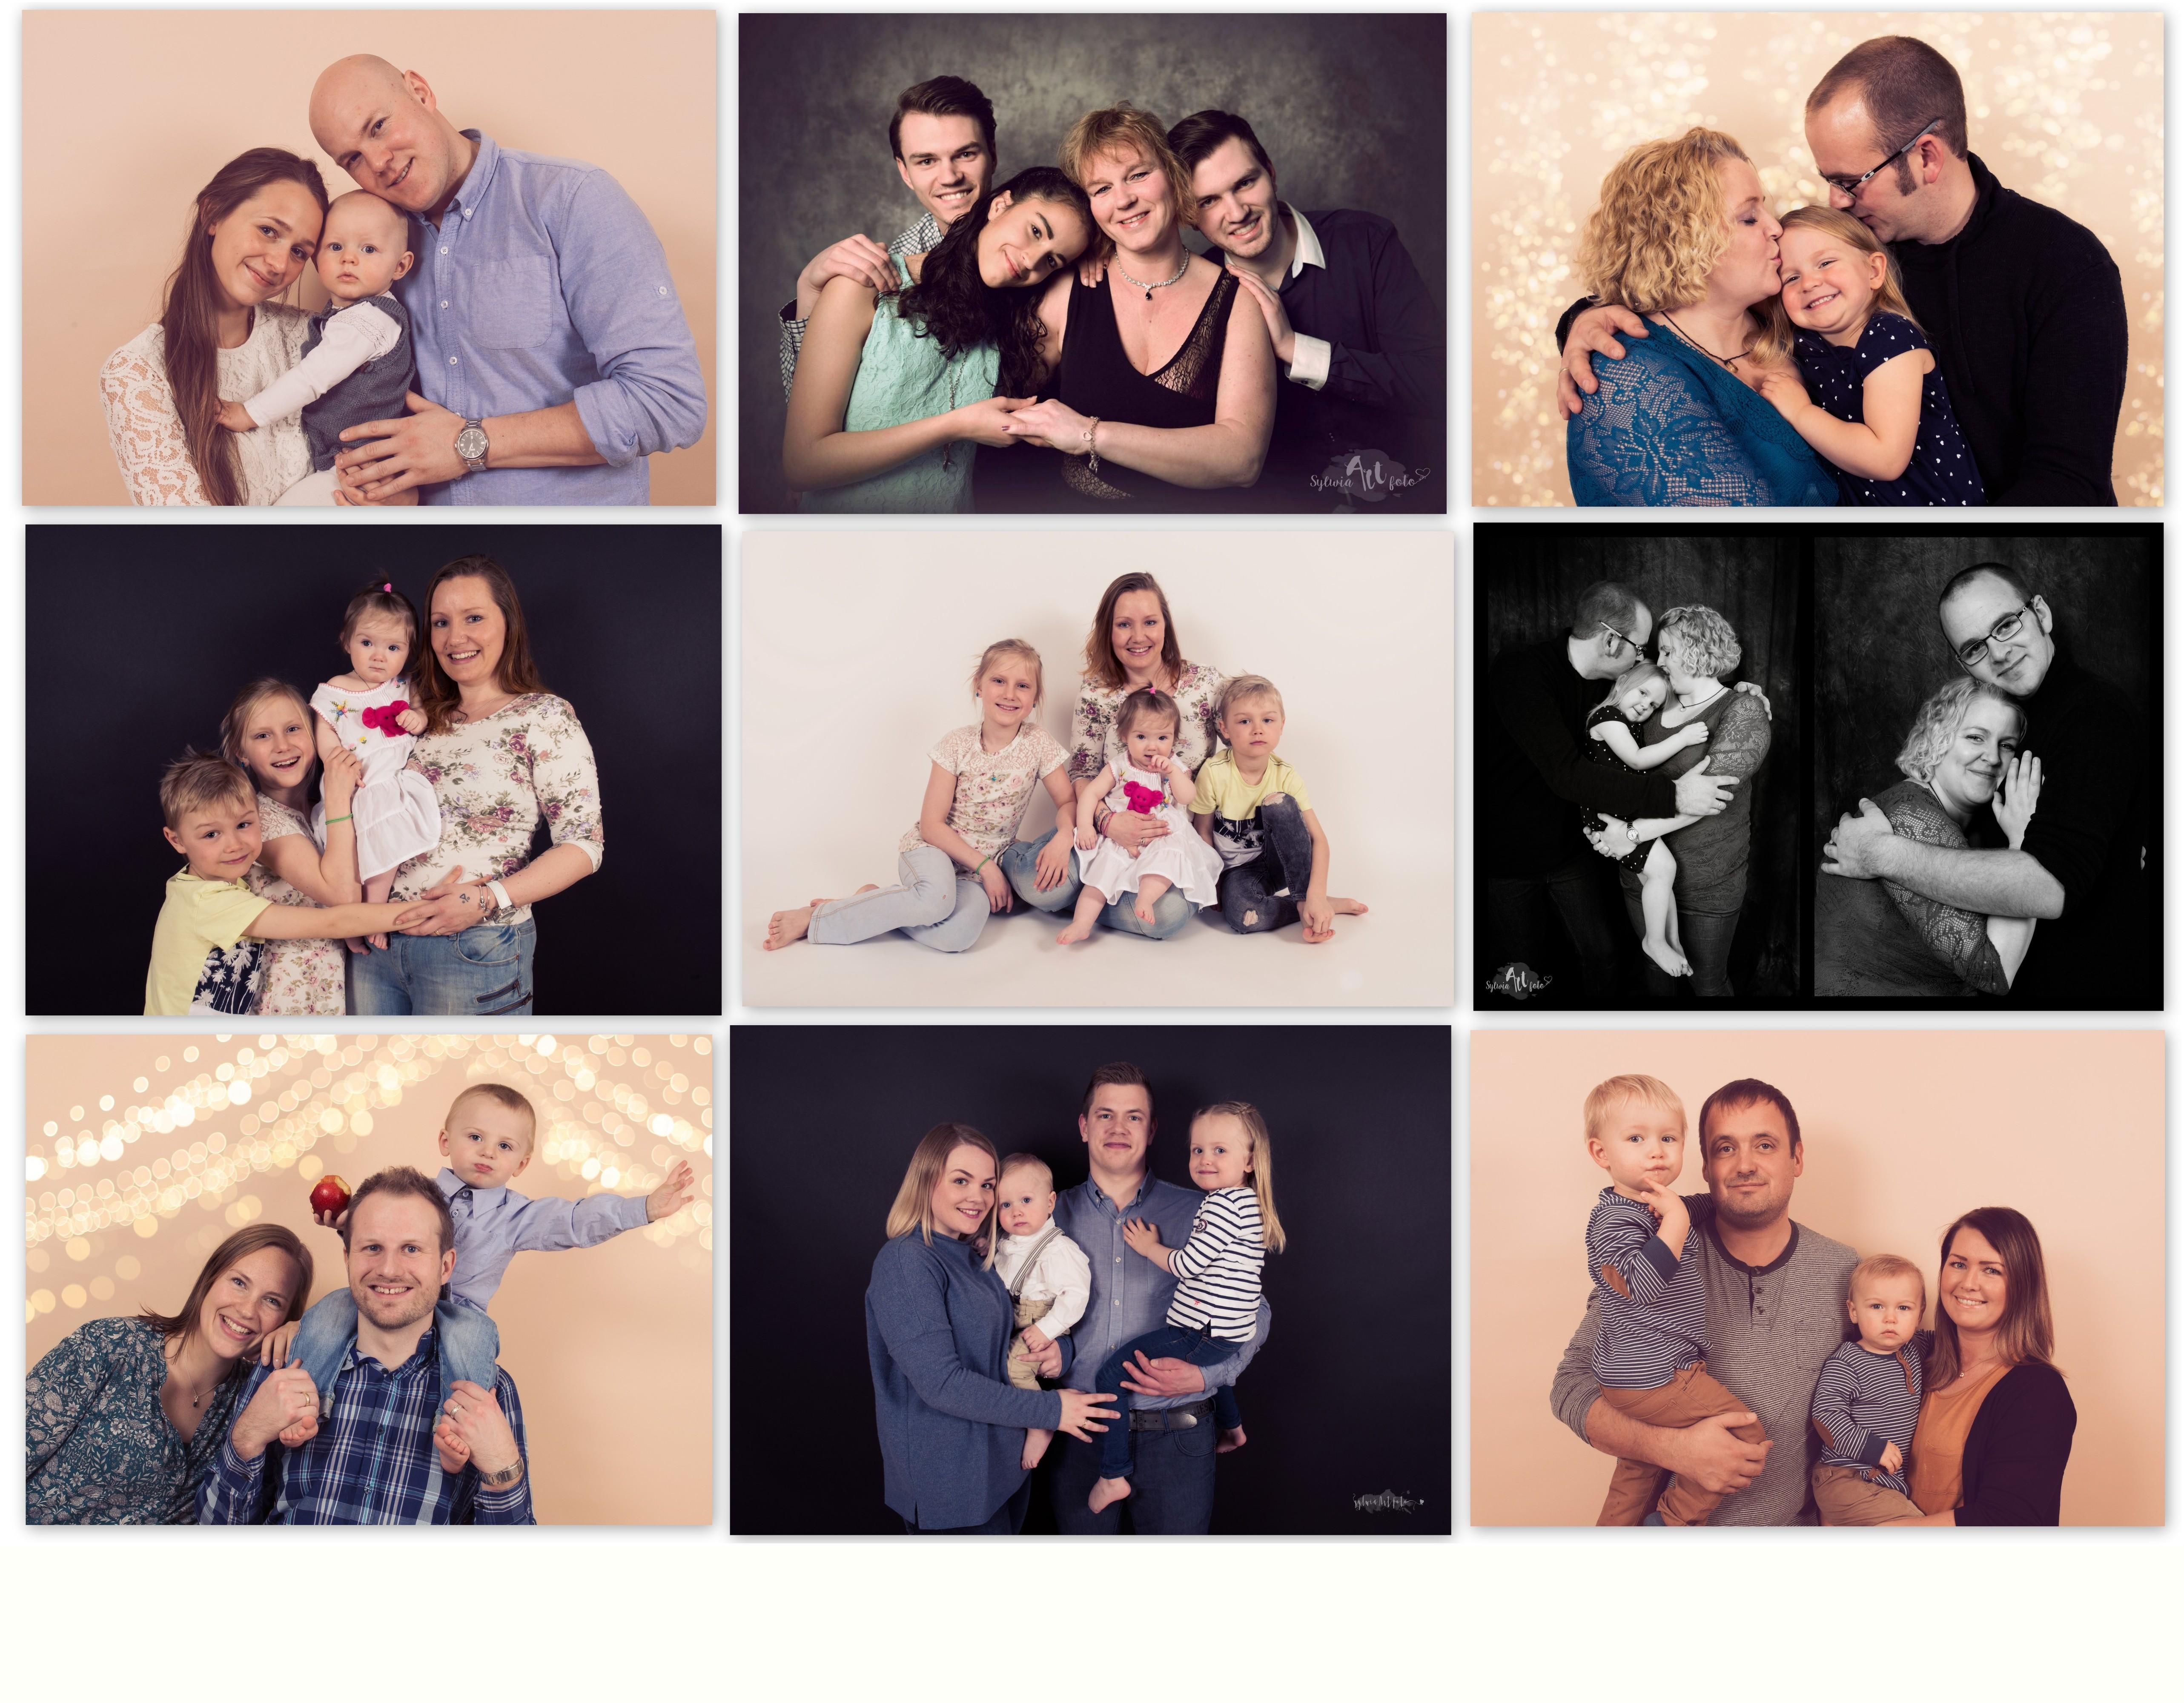 Sylwia_familiebilder